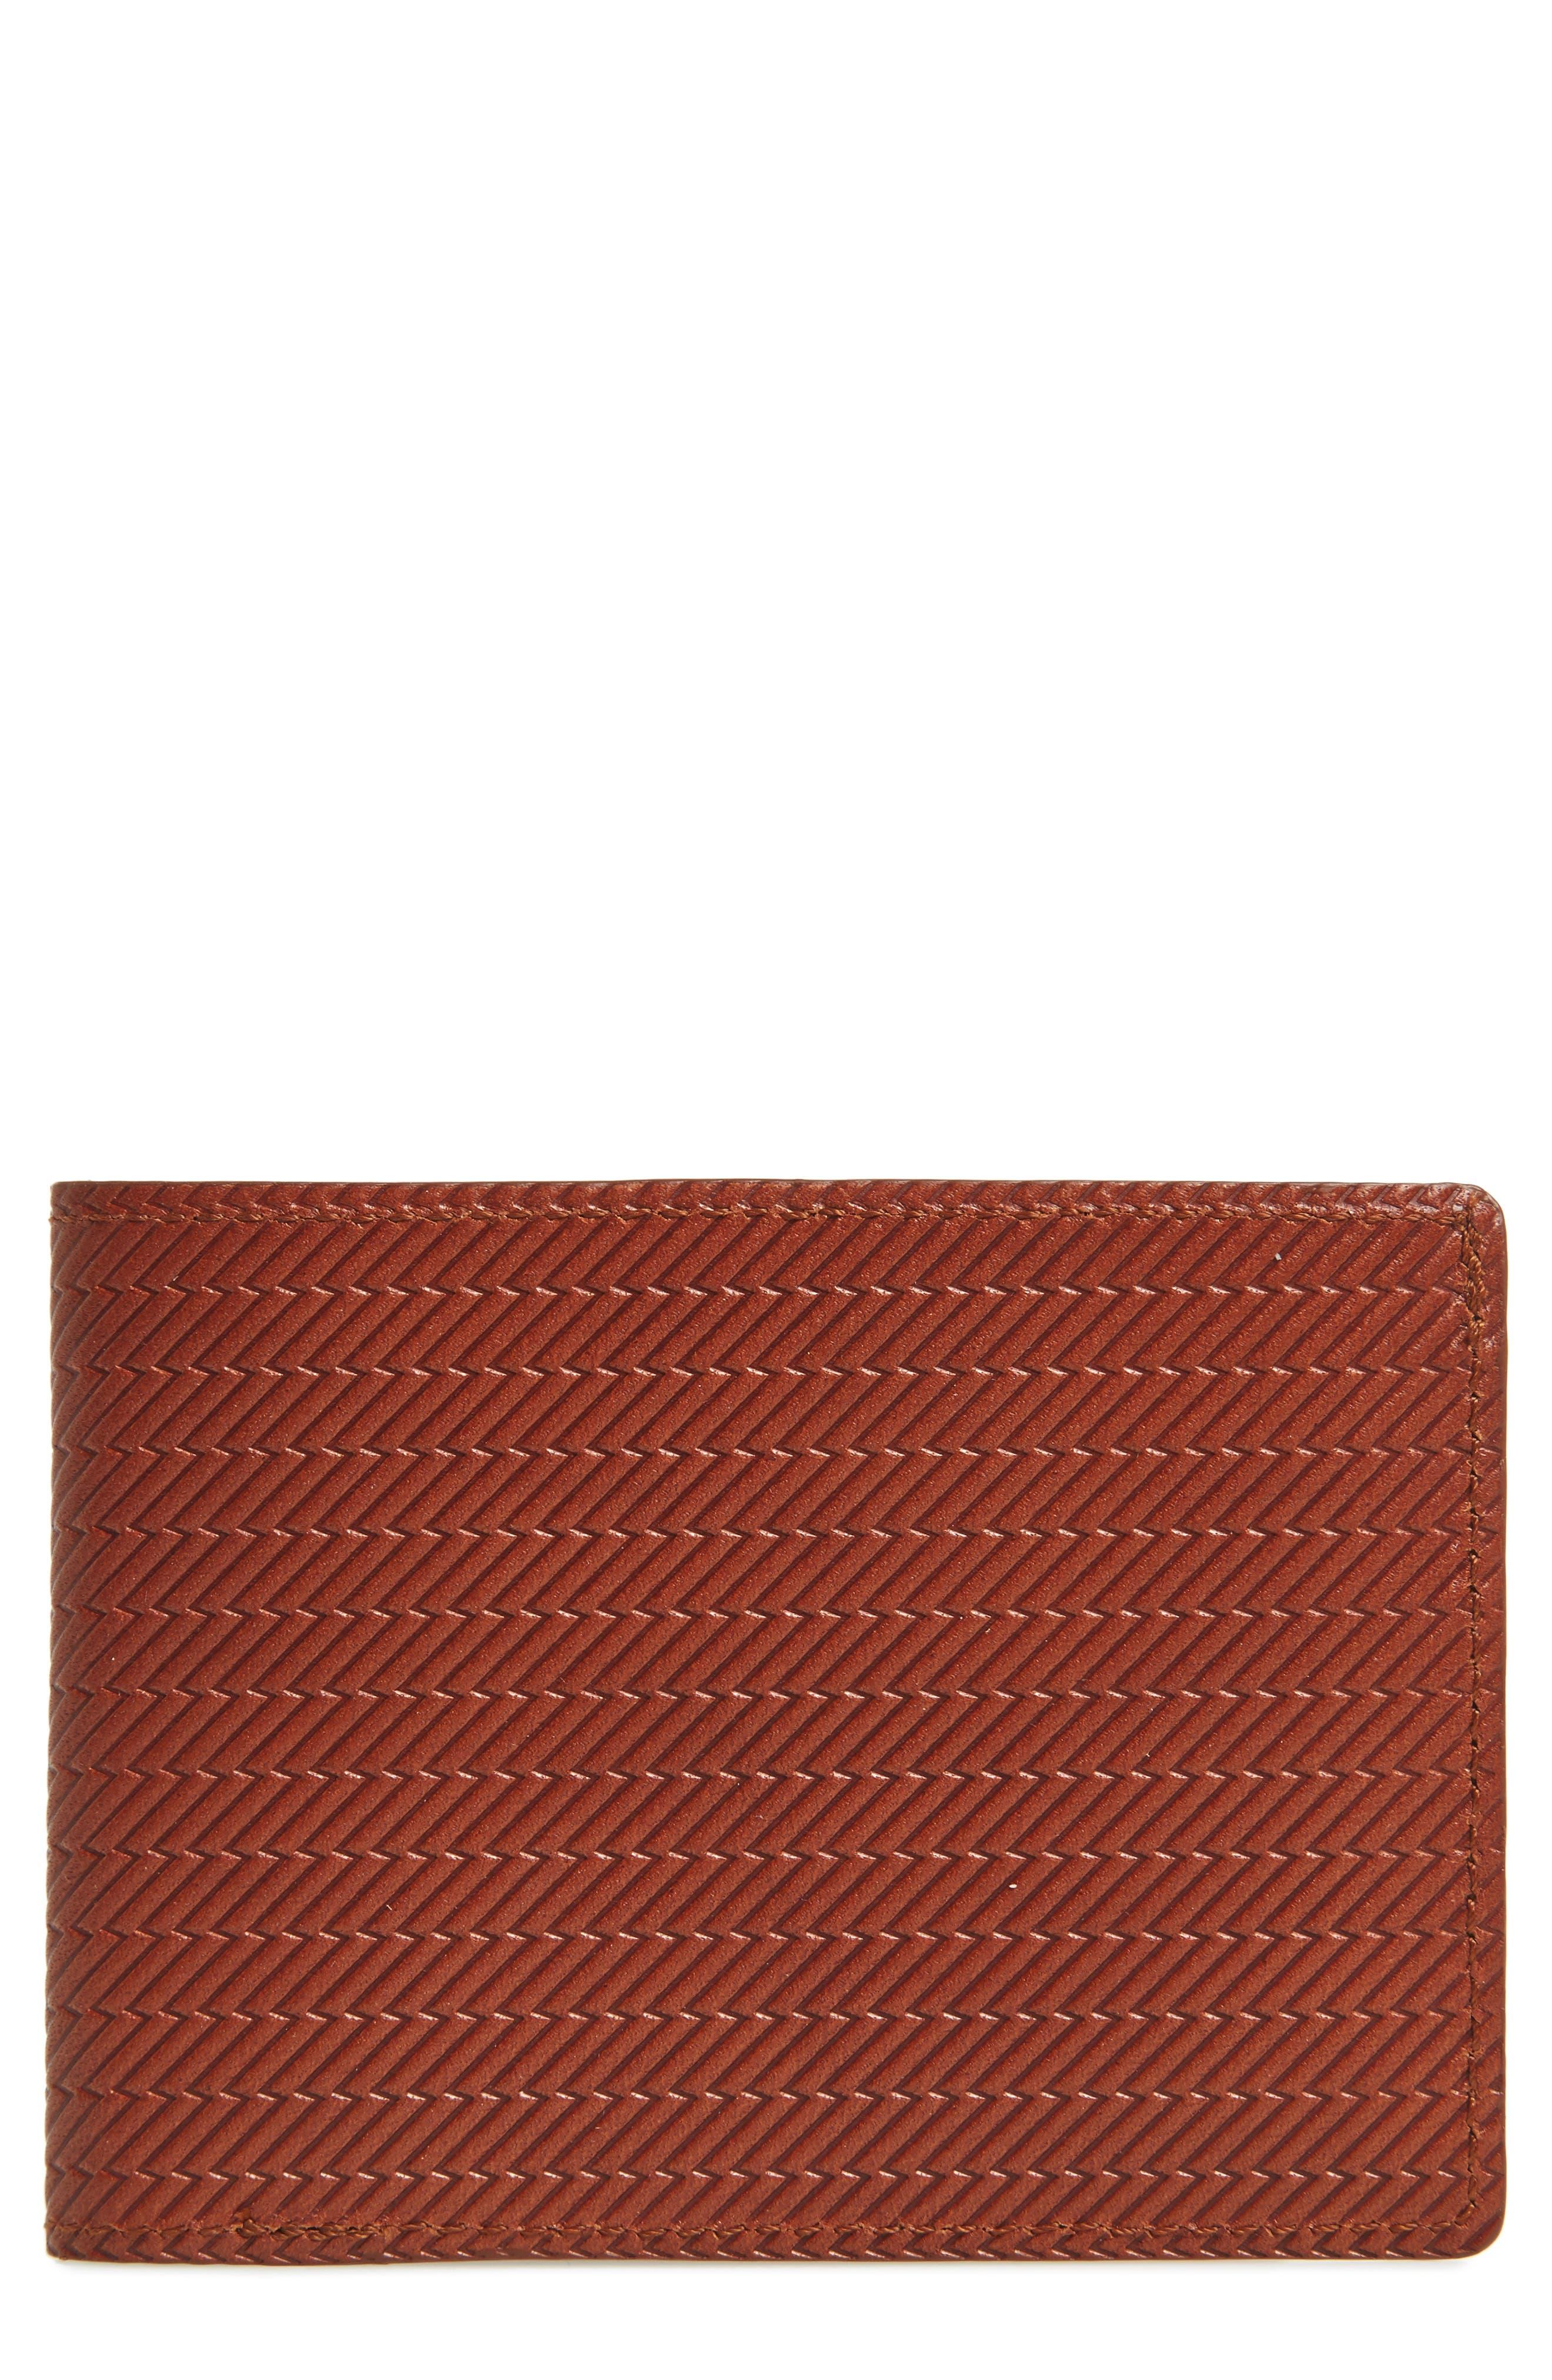 Main Image - Shinola Leather Wallet